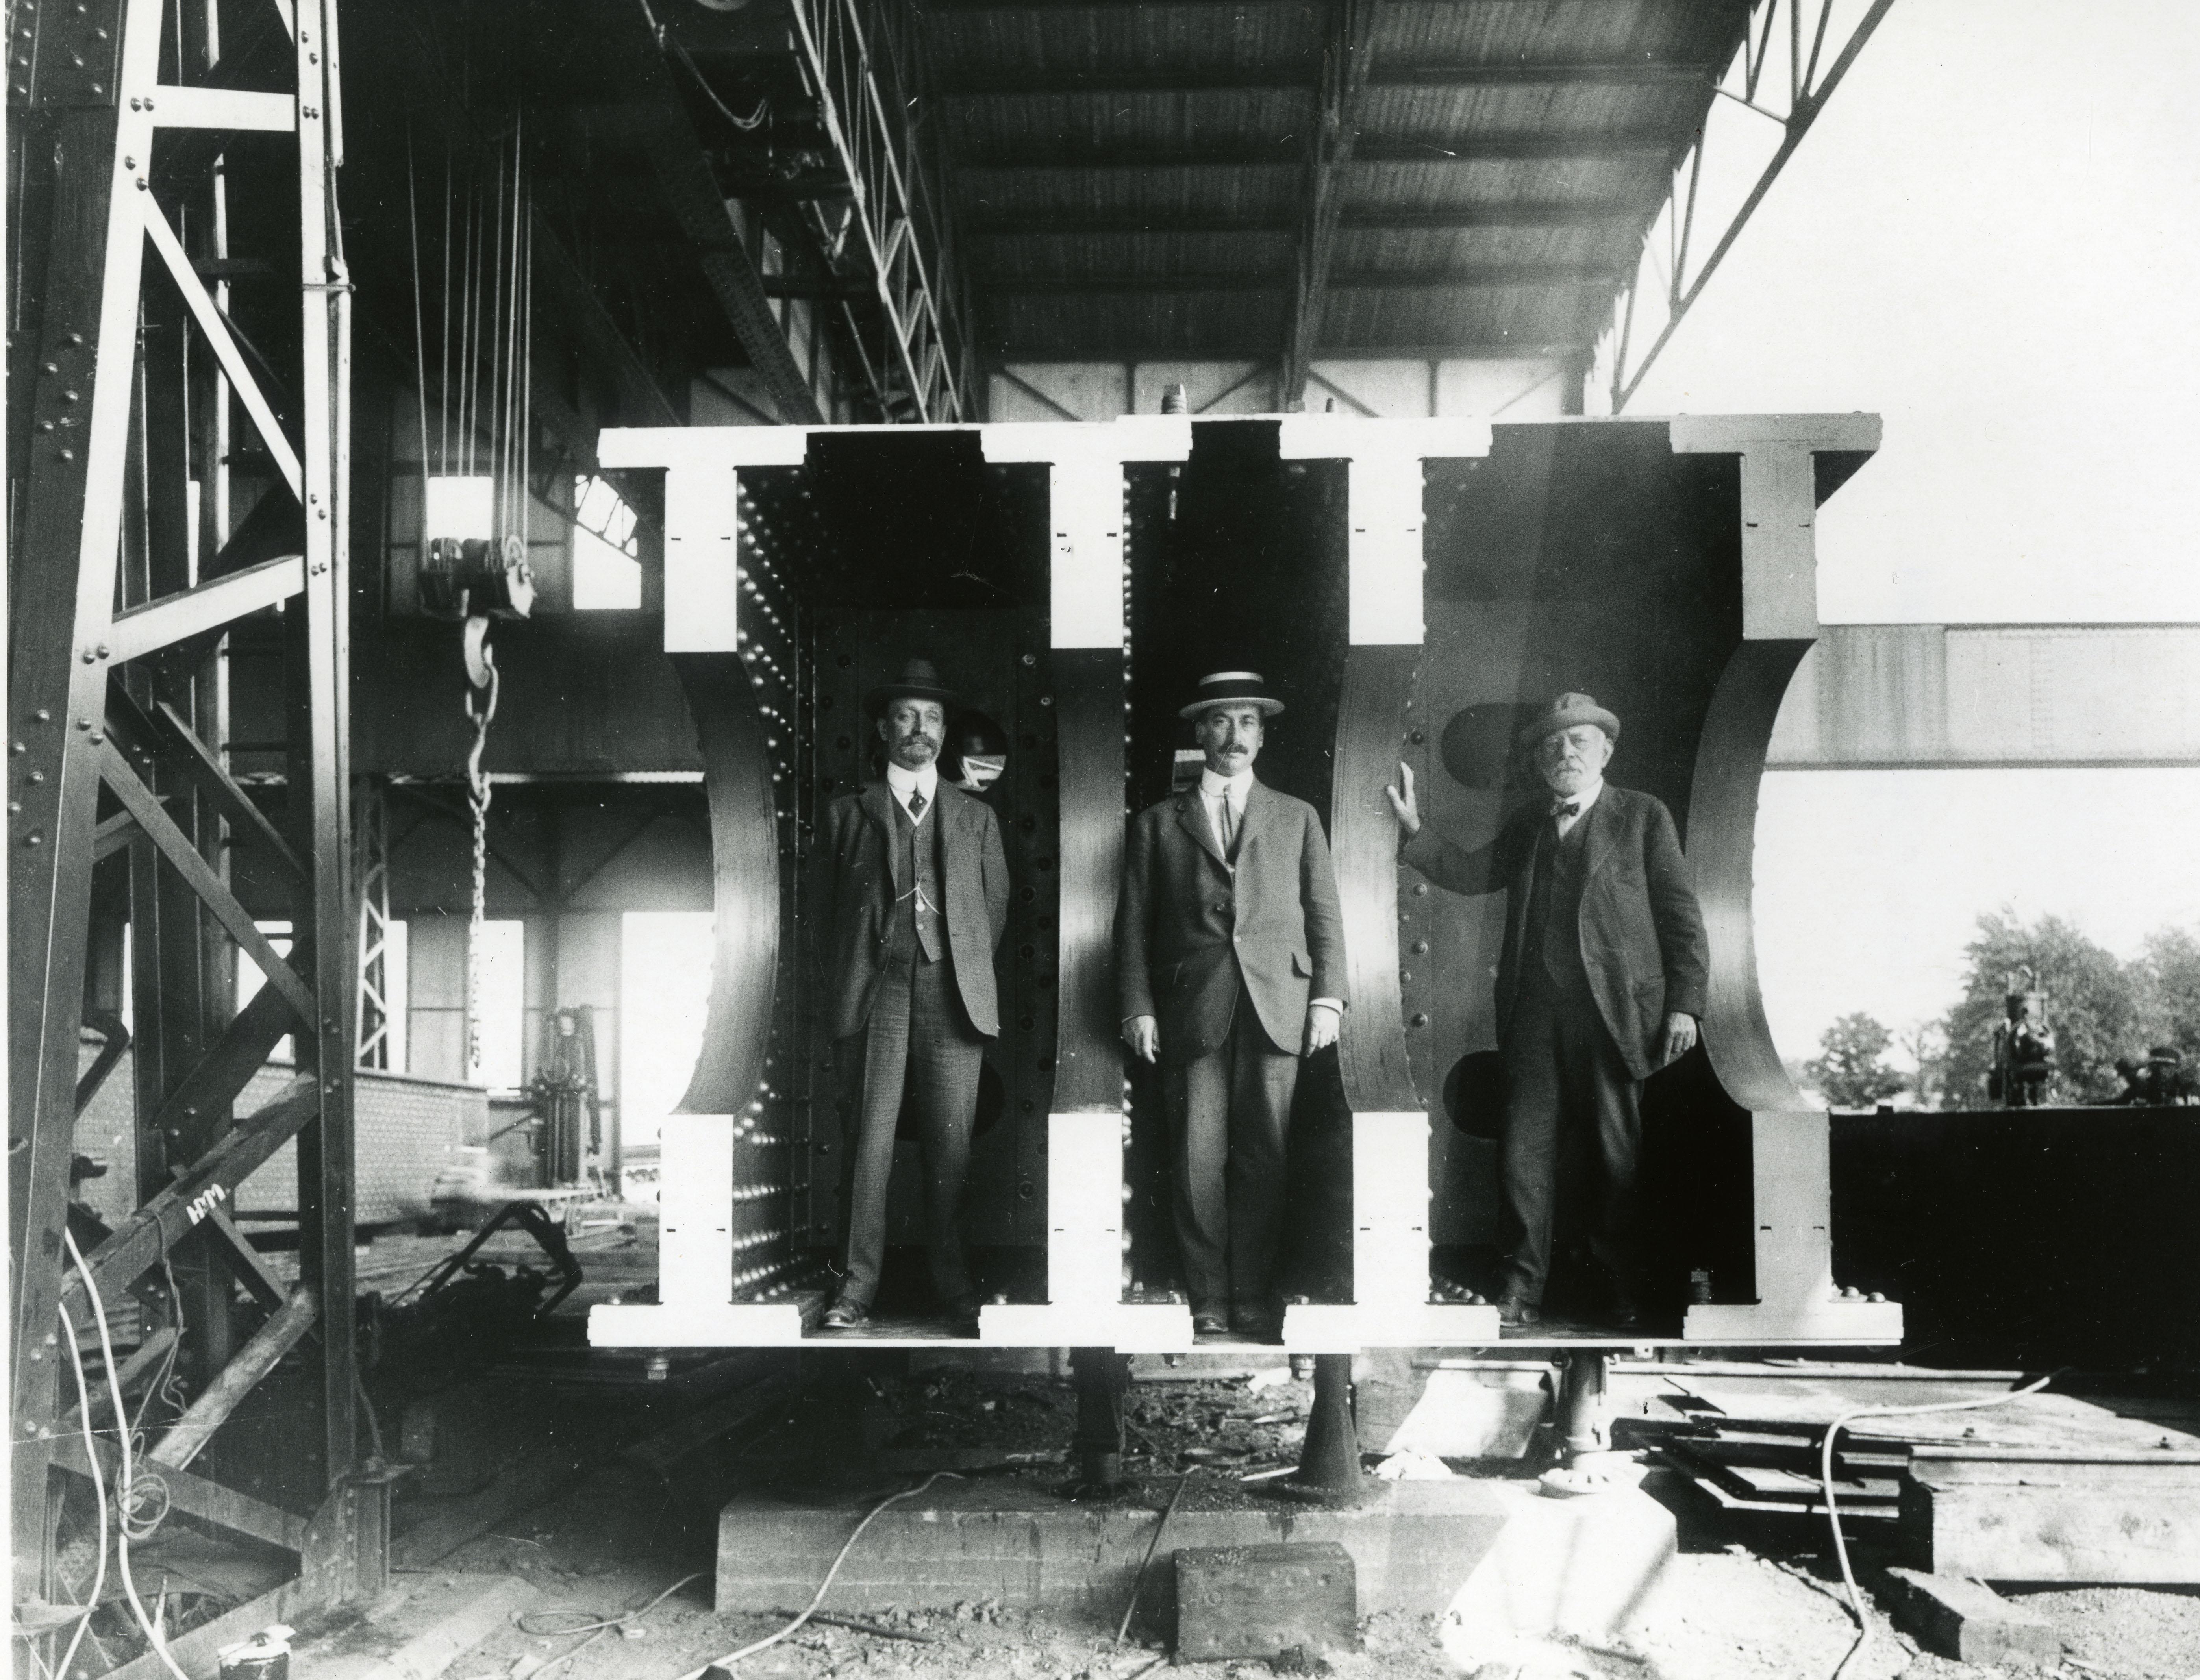 Photograph of Quebec Bridge Board of Engineers standing in bridge cantilever, left to right: Ralph Modjeski, Charles Monsarrat and C.C. Schneider, circa 1910s.